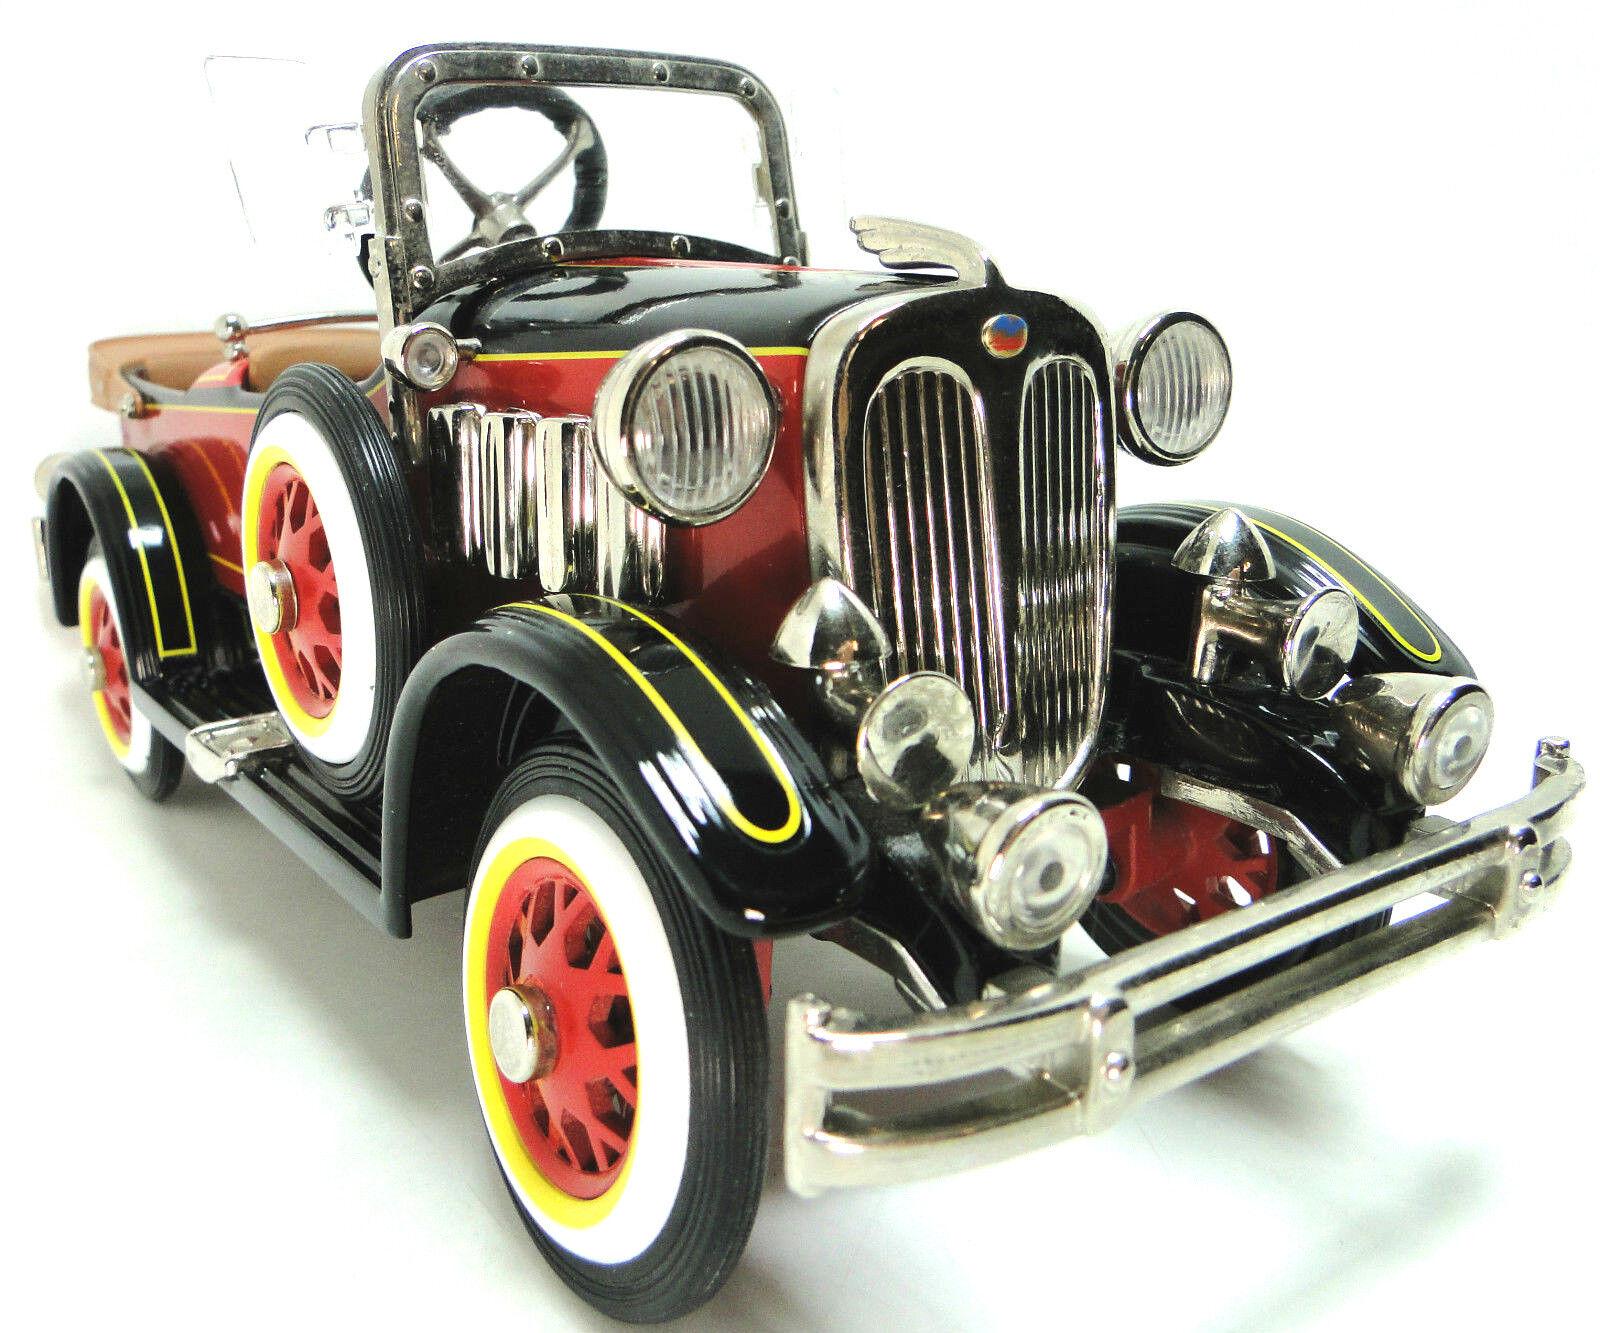 Ford T 1 Pedal Car Vintage 1920 Antique Metal Collector 24 READ FULL DESCRIPTION